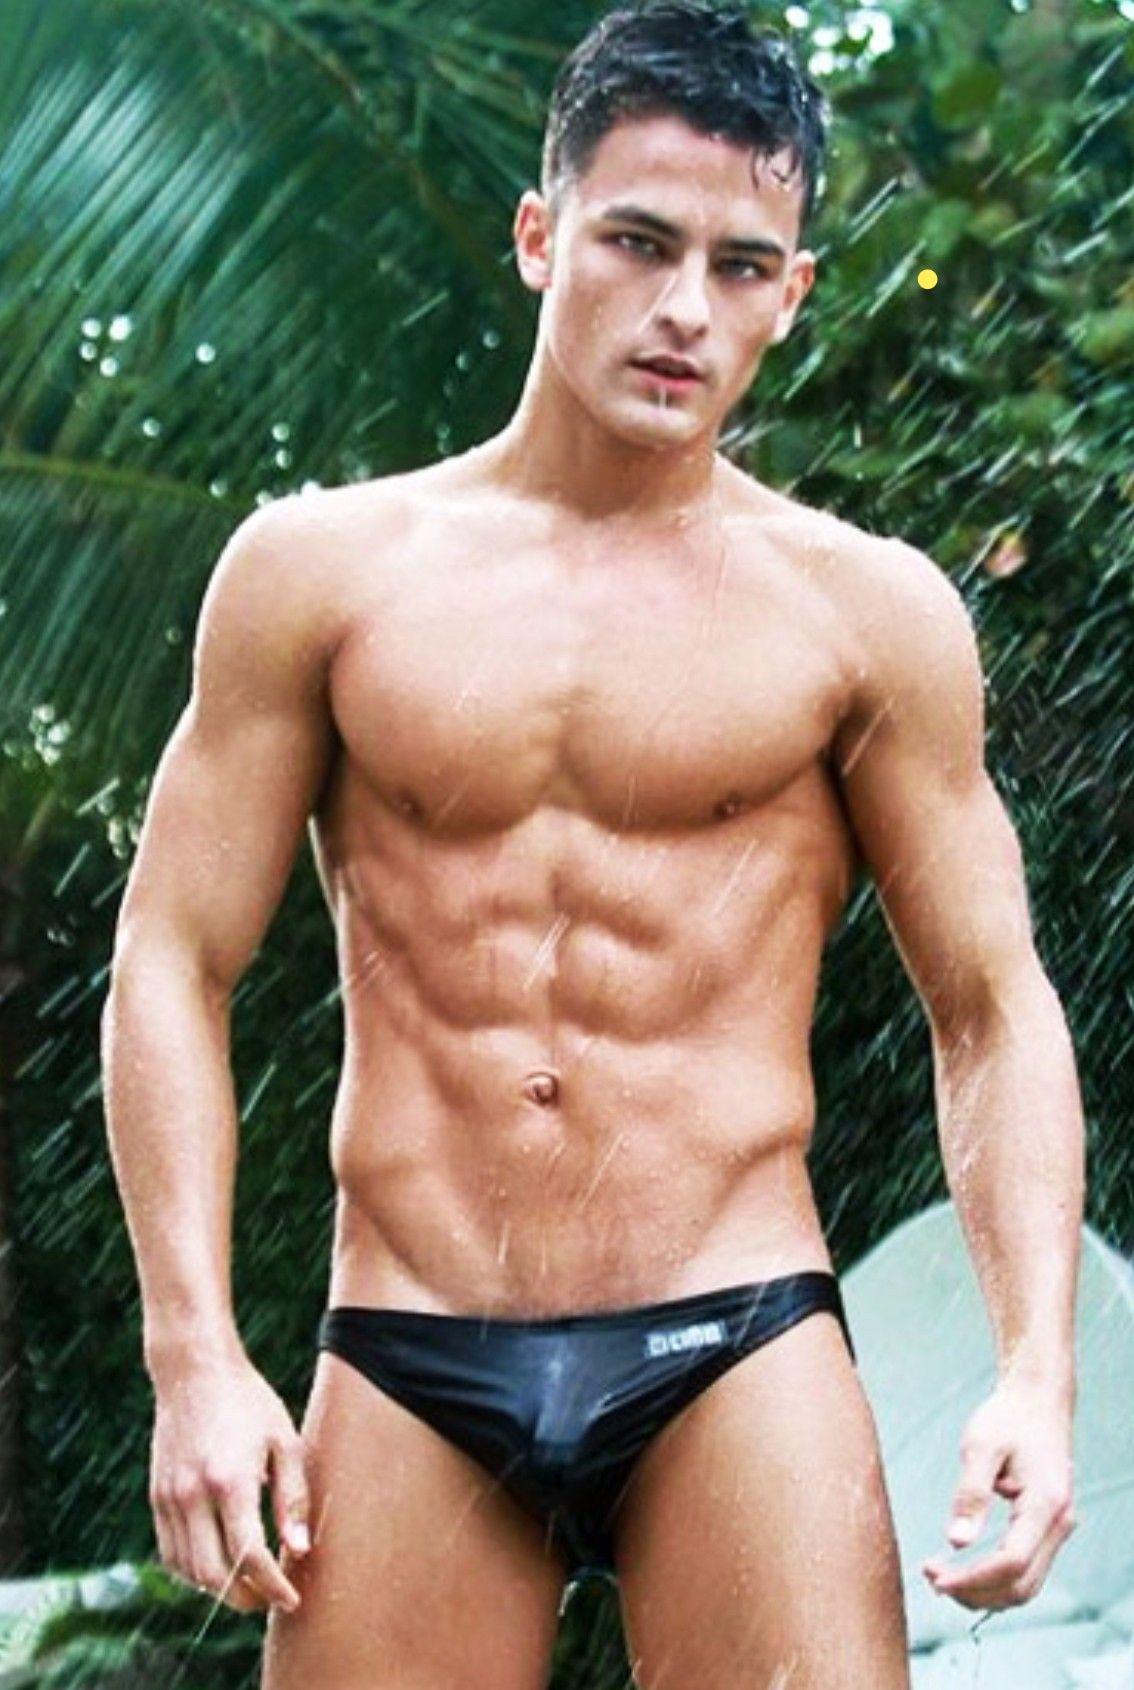 b20f05cb3f Ripped swim stud showing VPL in his wet Speedos. More hot men @Adamb18